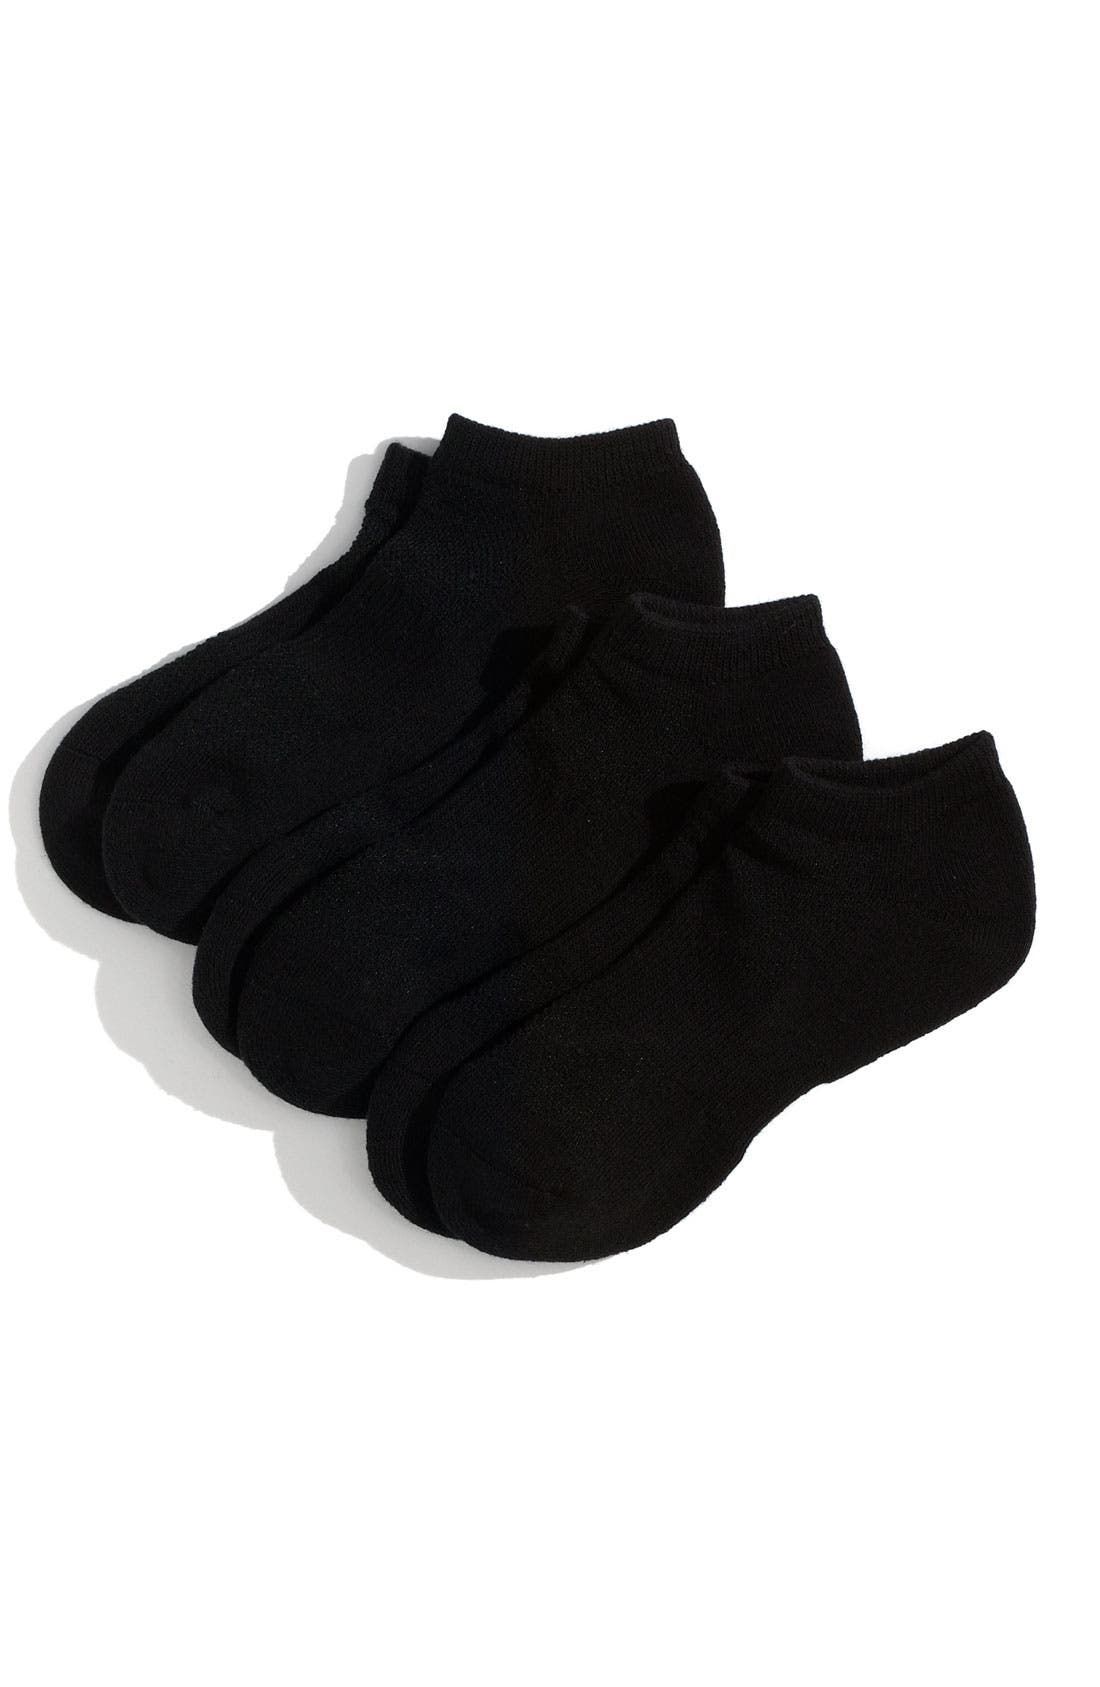 Main Image - Nordstrom Low Cut Active Socks (3-Pack)(Toddler, Little Boys & Big Boys)